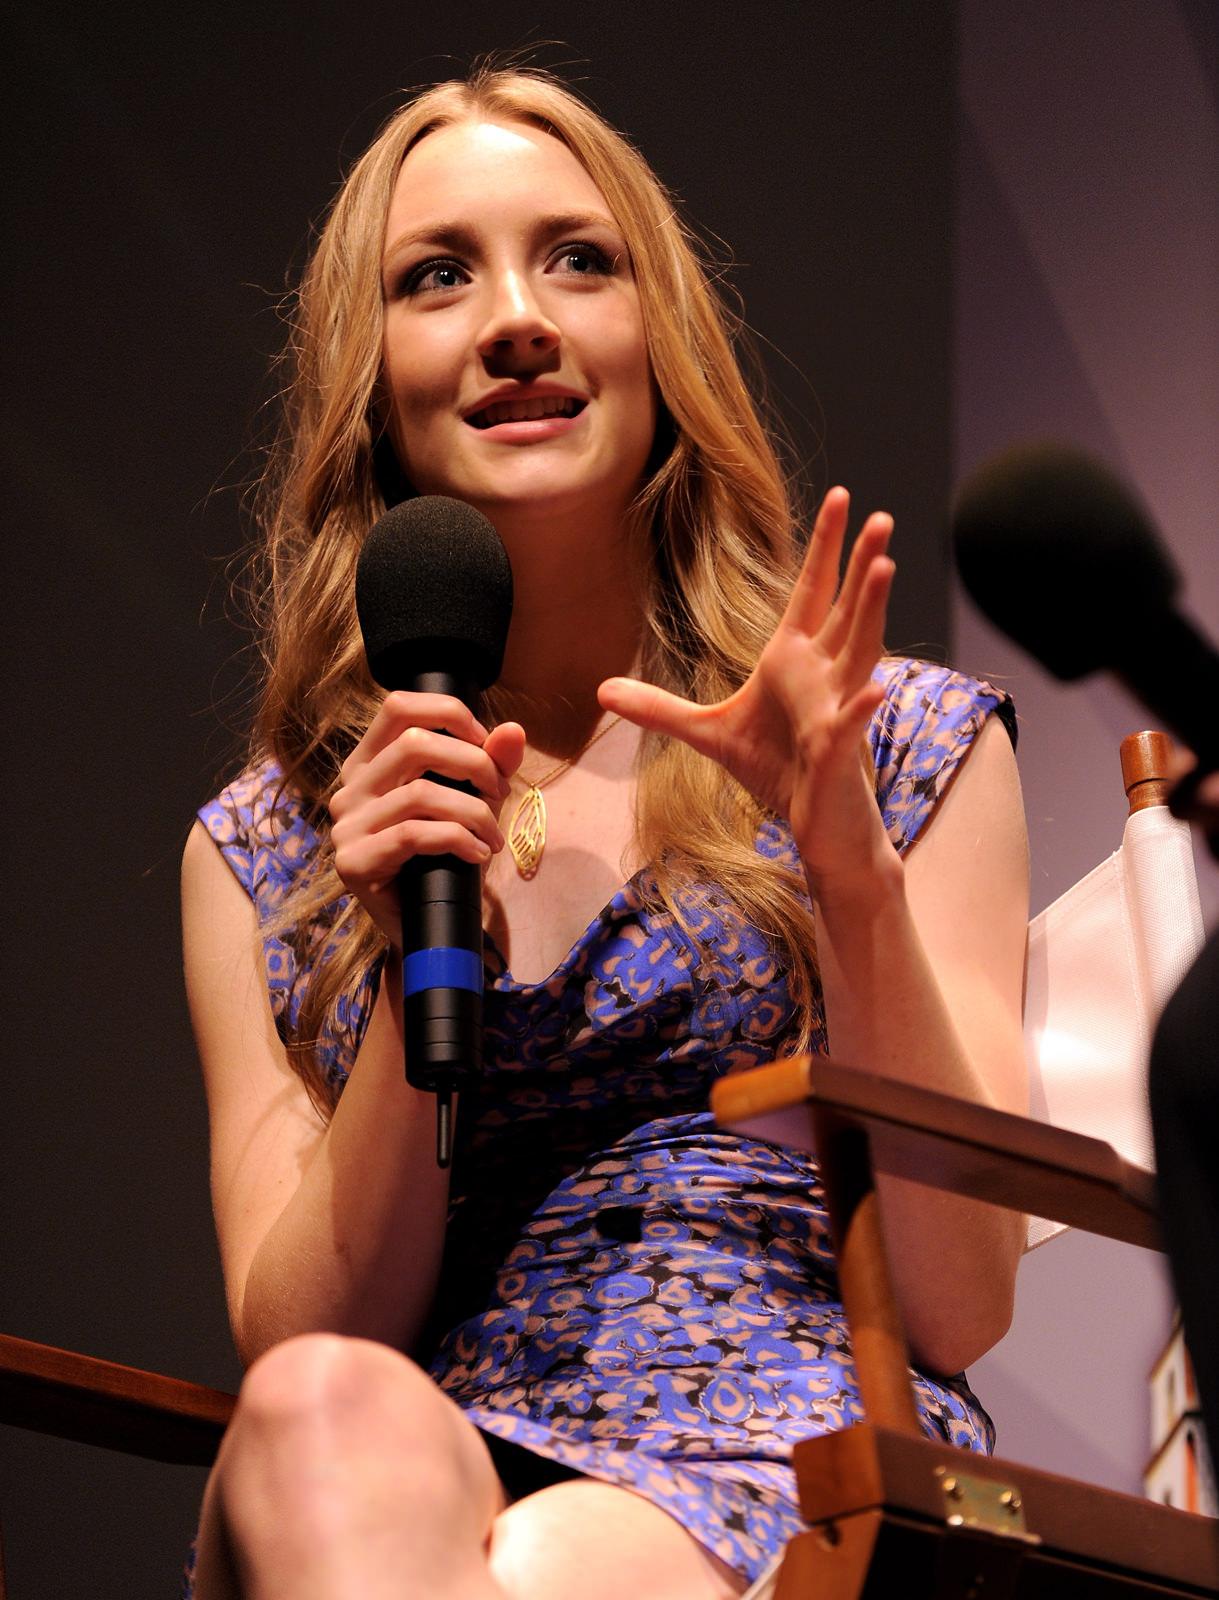 Saoirse Ronan Photo Gallery